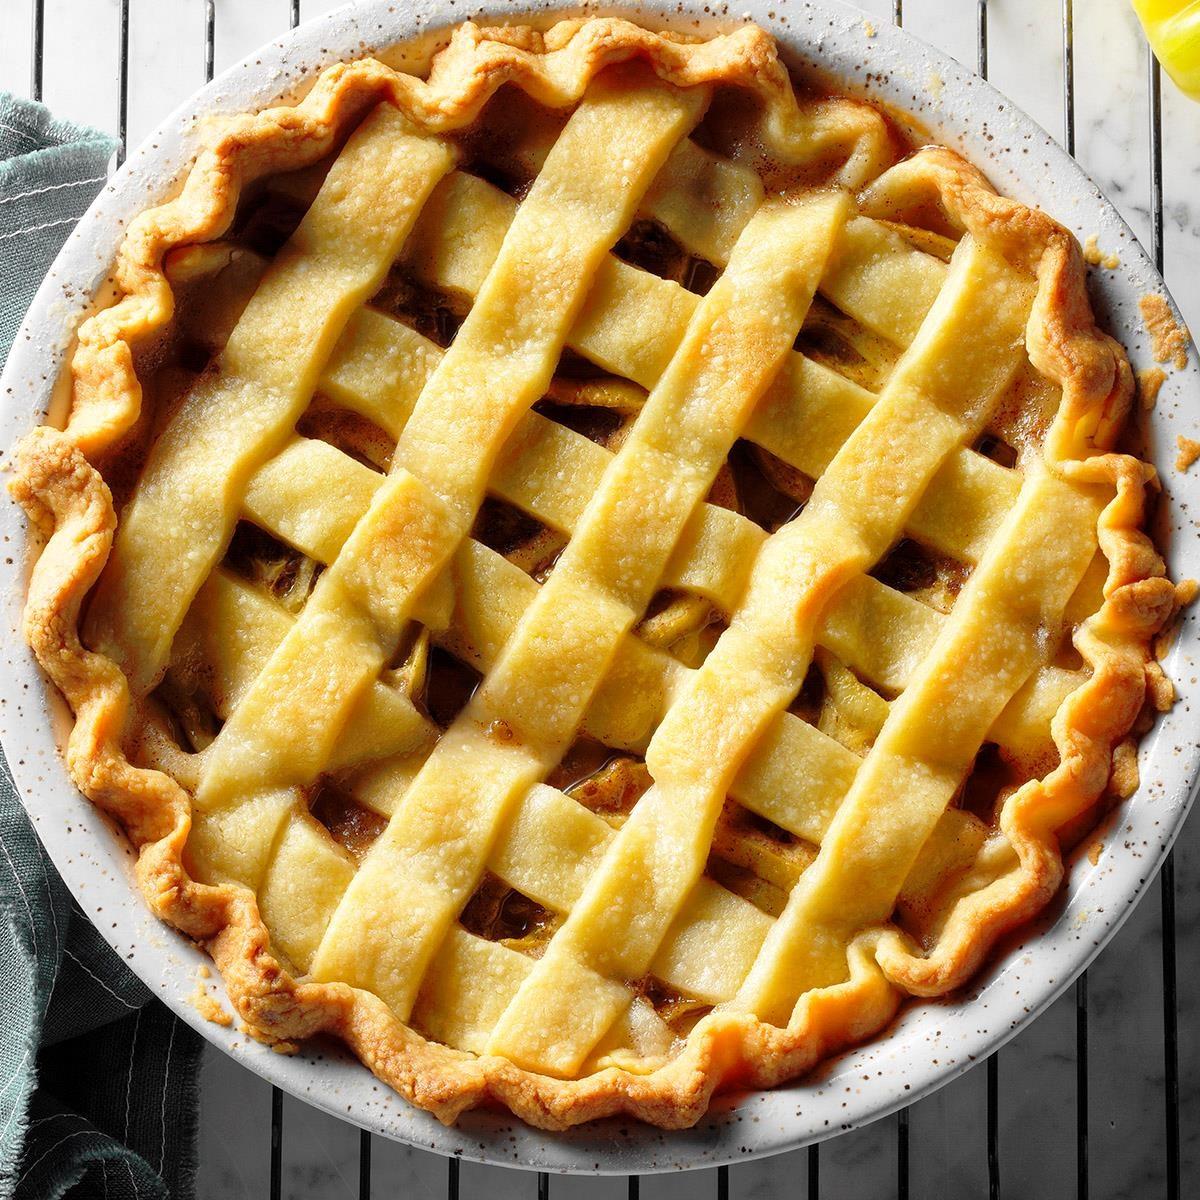 tomato pie recipe recipes dessert taste plum purple tomatoes handed down garden tasteofhome